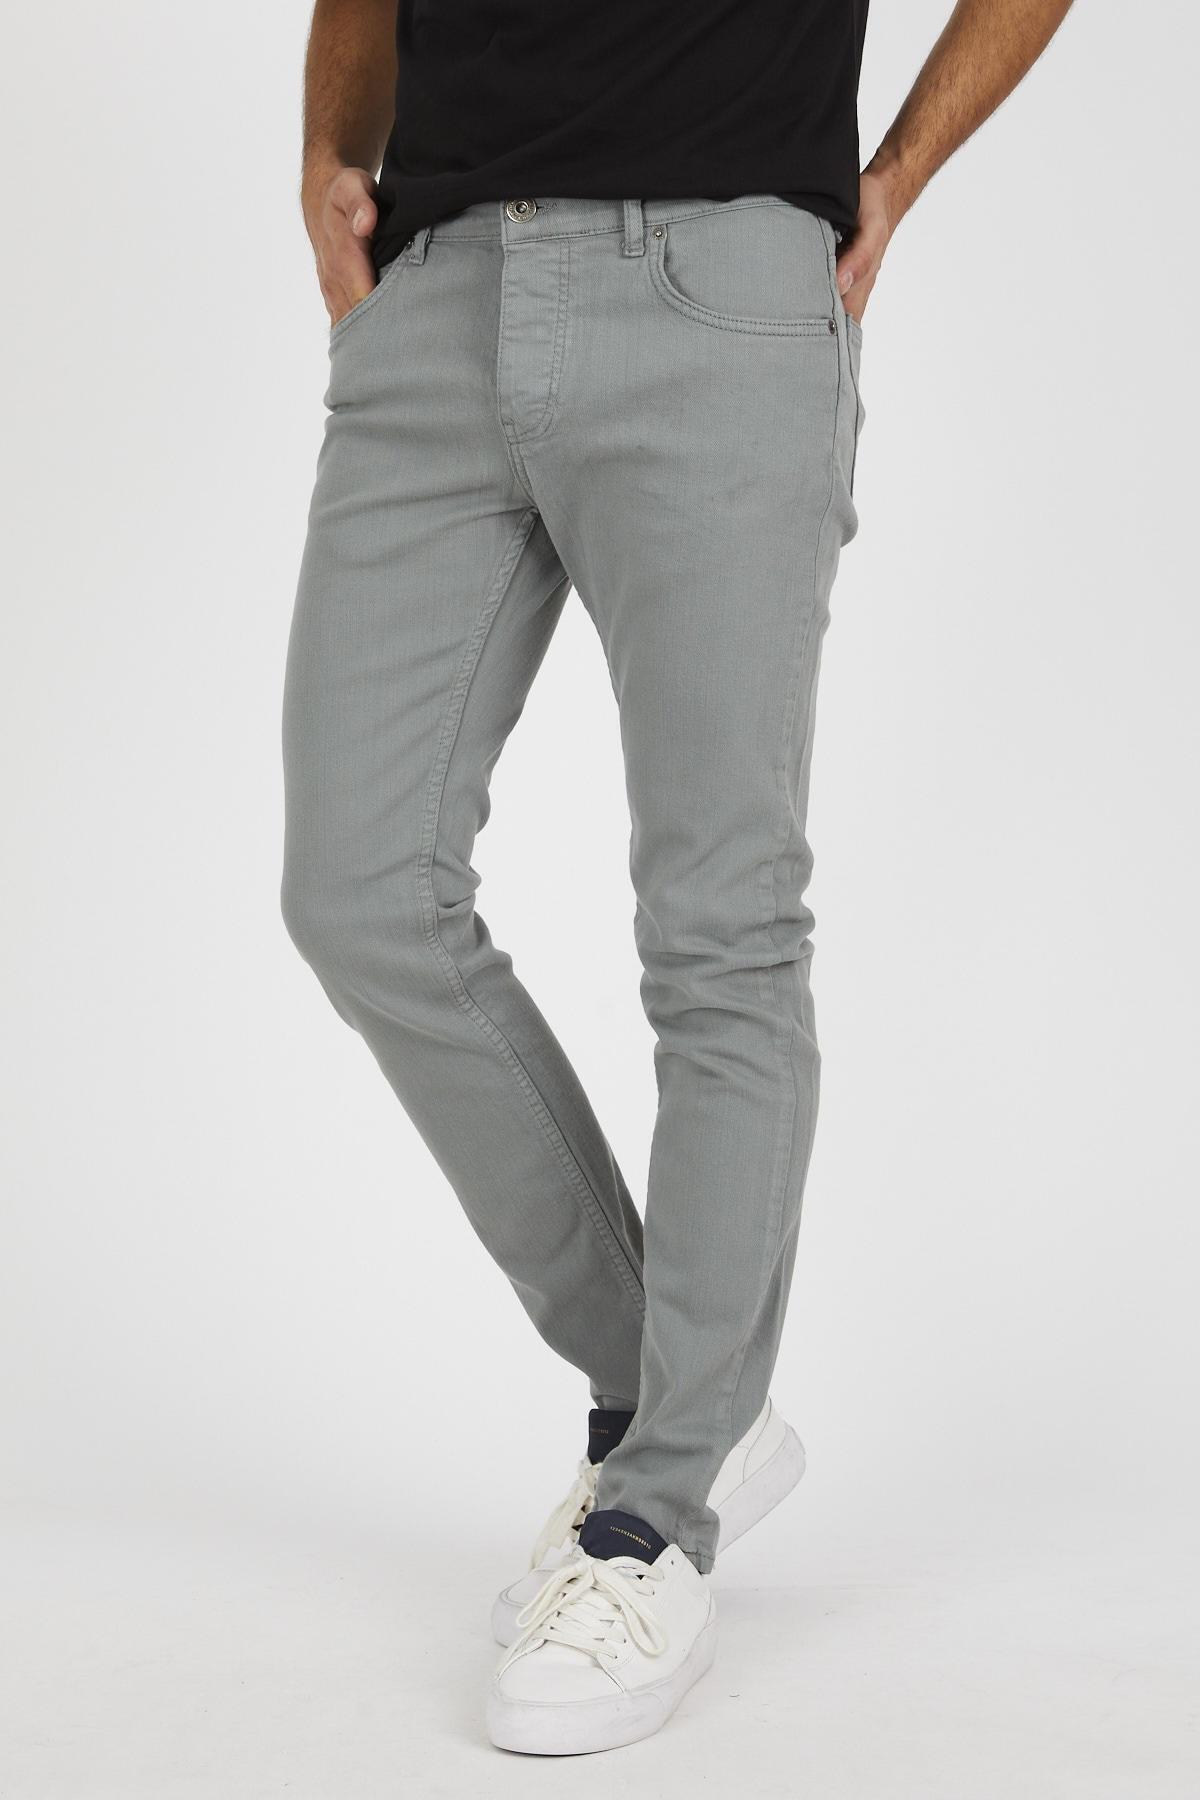 Denim Republic Erkek Mint Slim Fit Pantolon 2